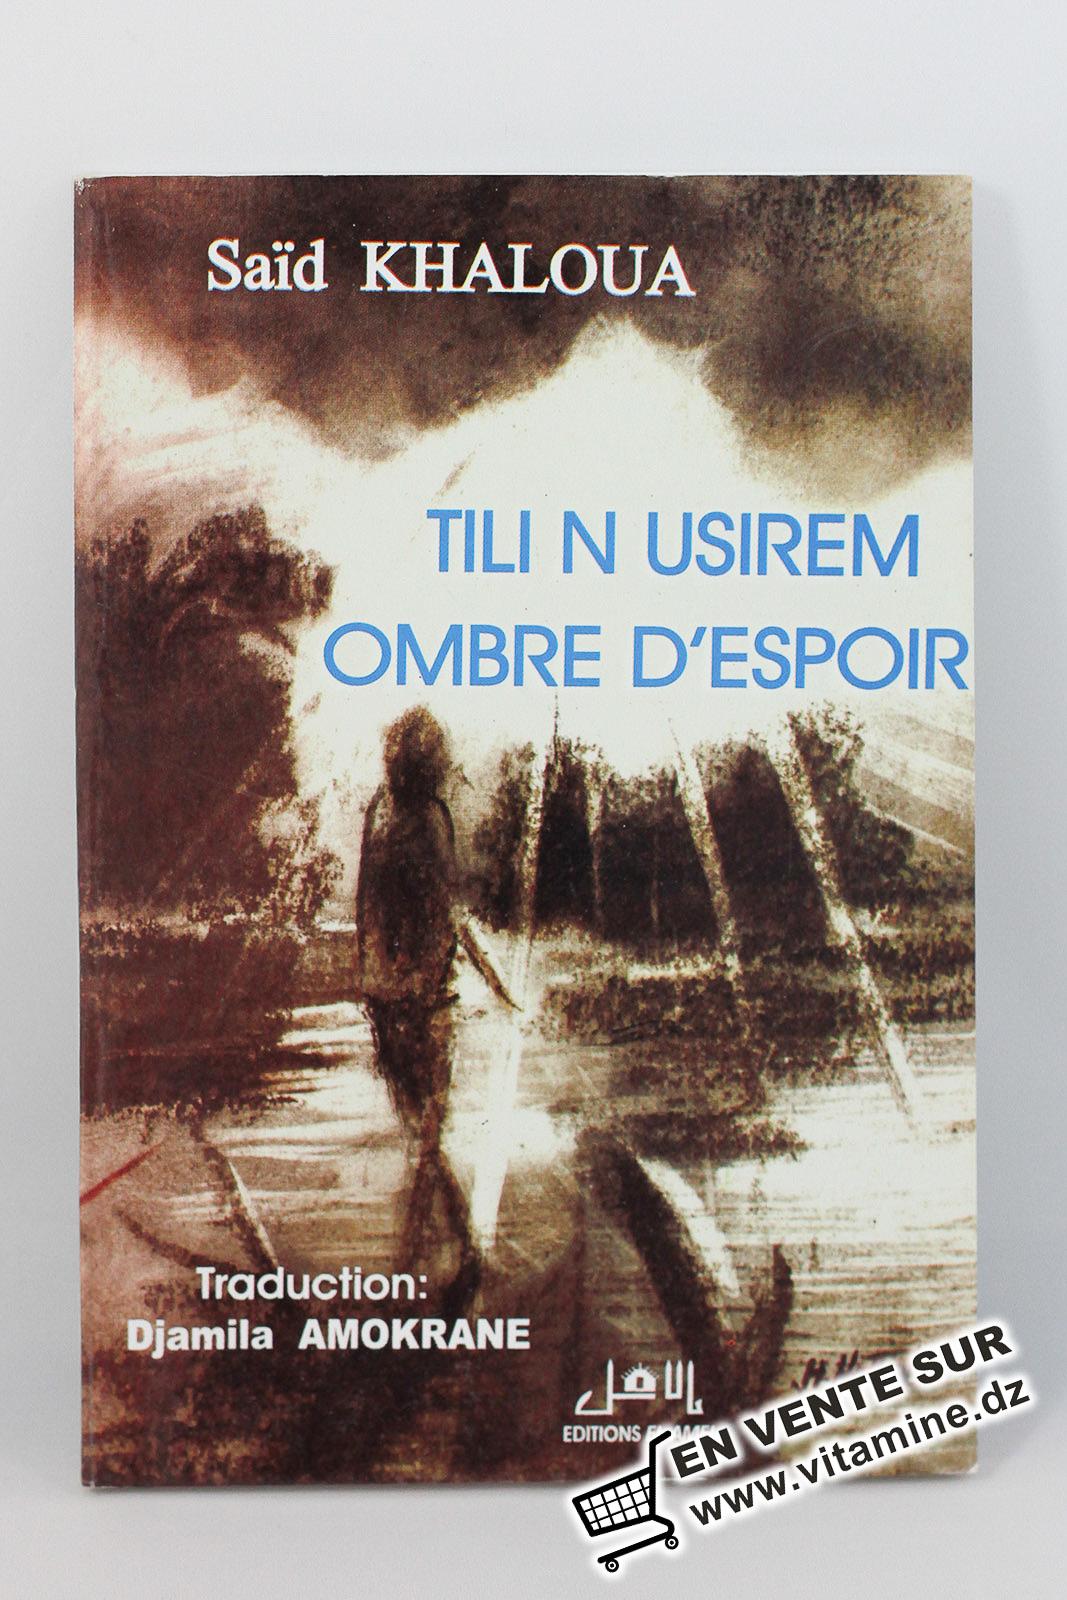 Said Khaloua - Tili N Usirem (Ombre d'Espoir)